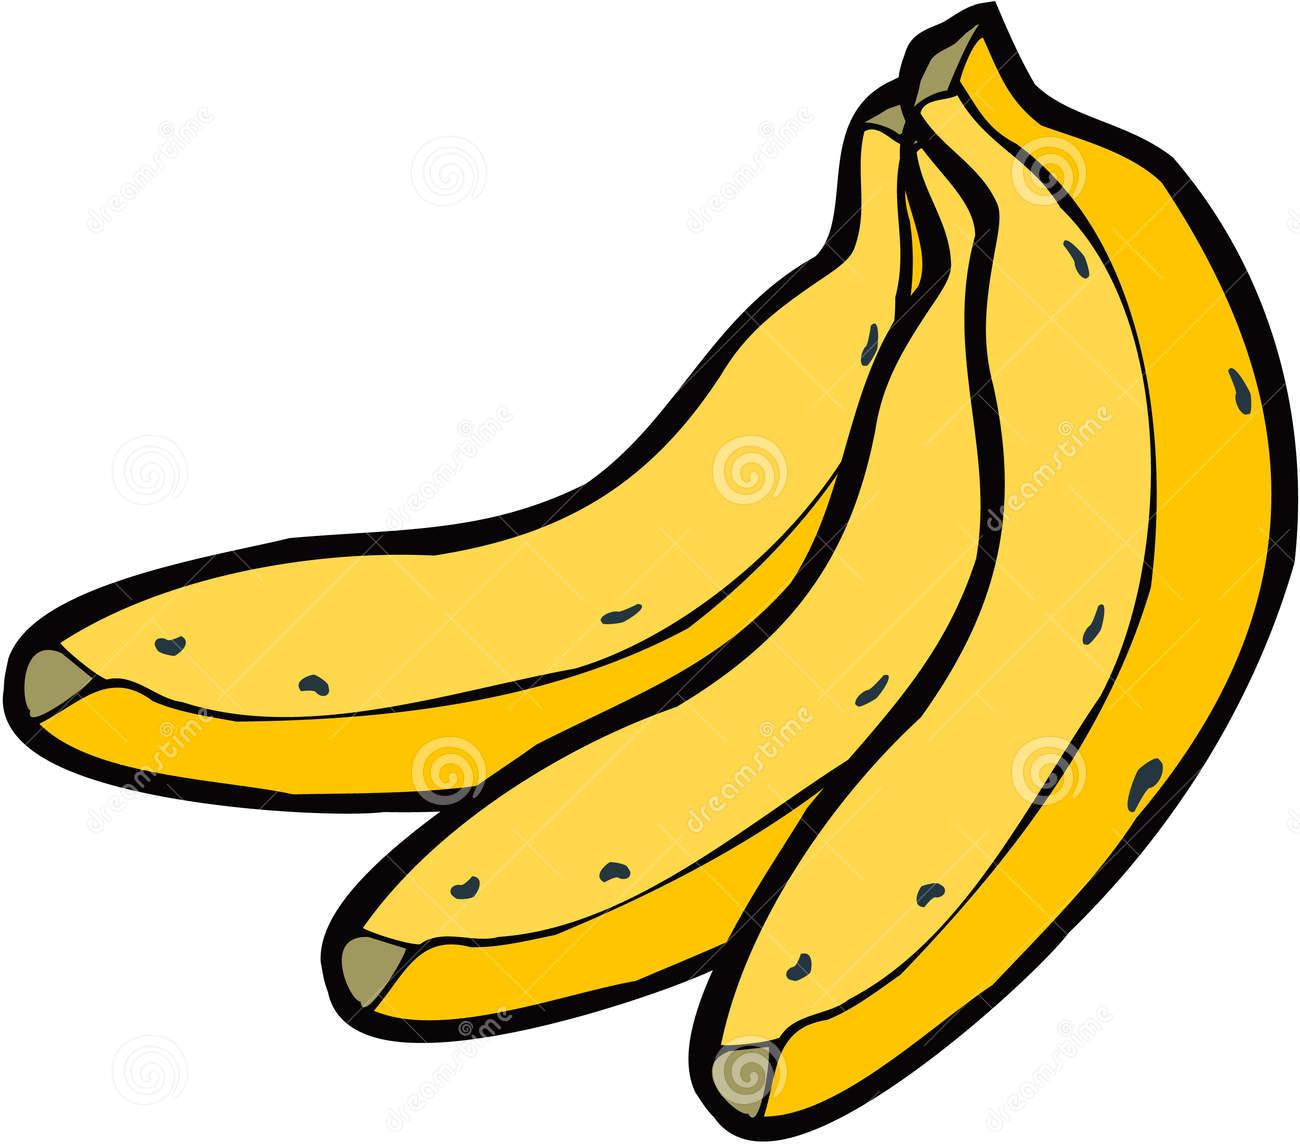 banana clipart black and white